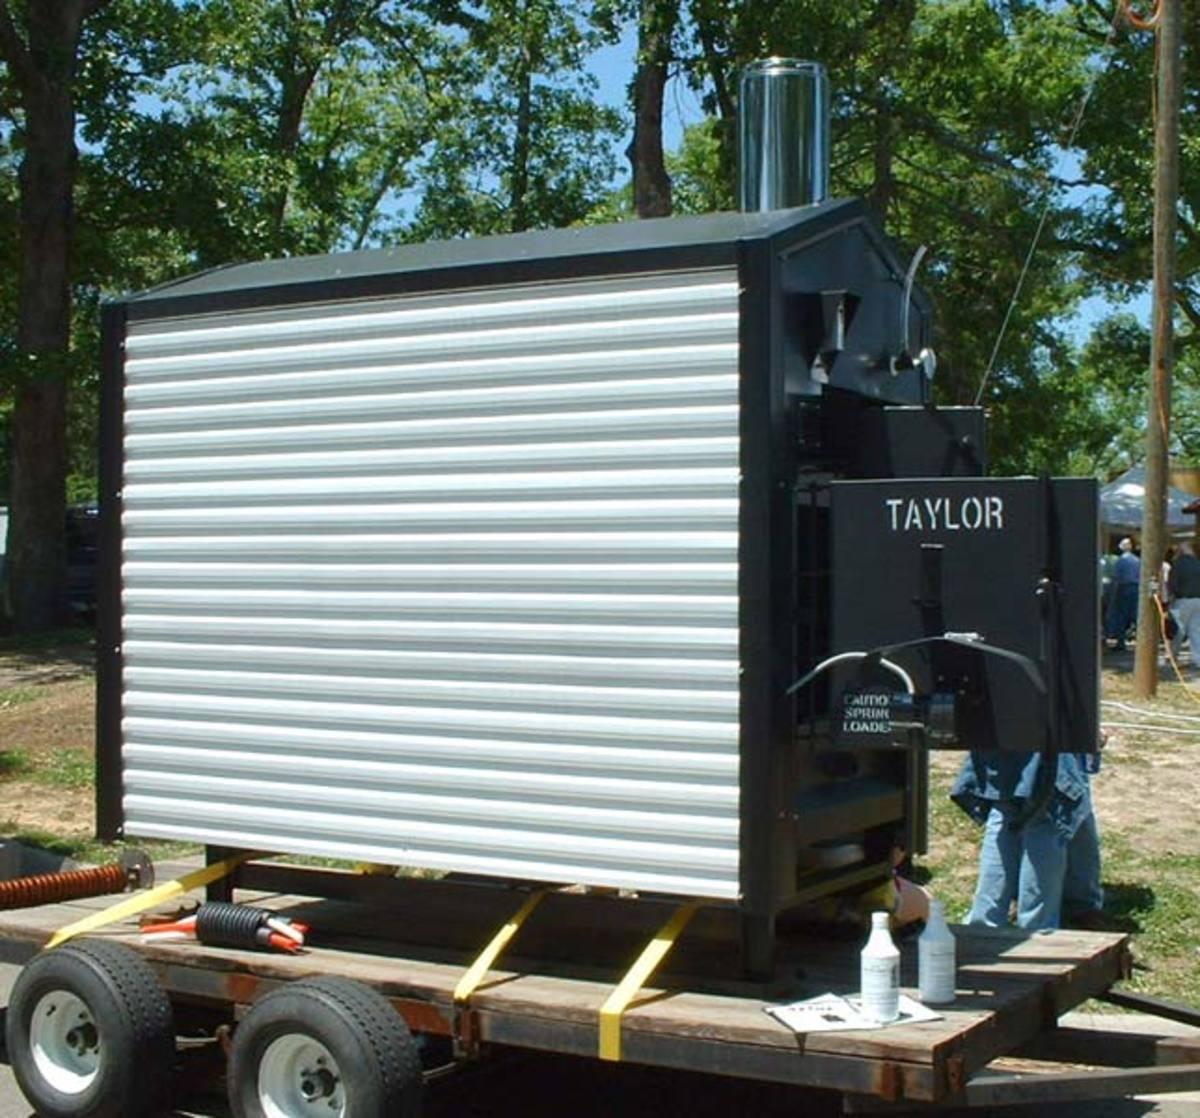 A Taylor Wood Stove